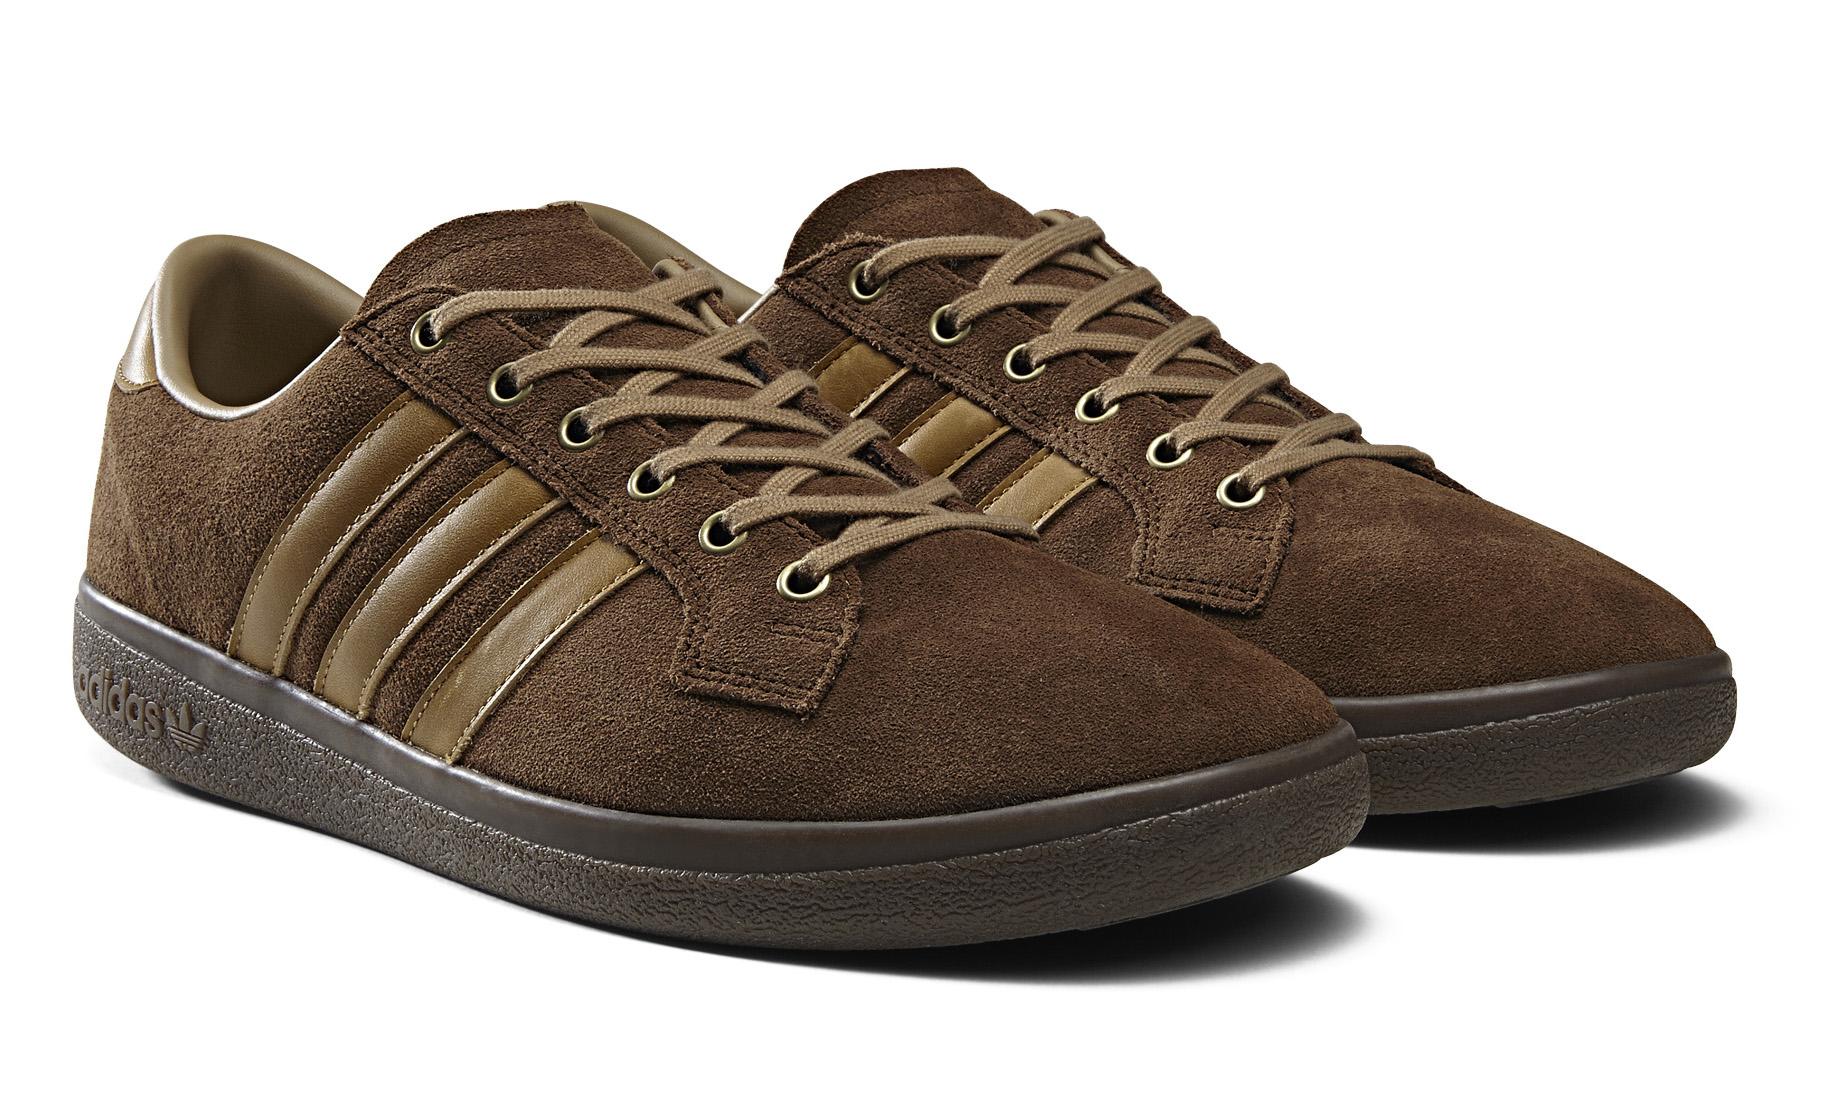 Adidas Spezial Bulhill Brown